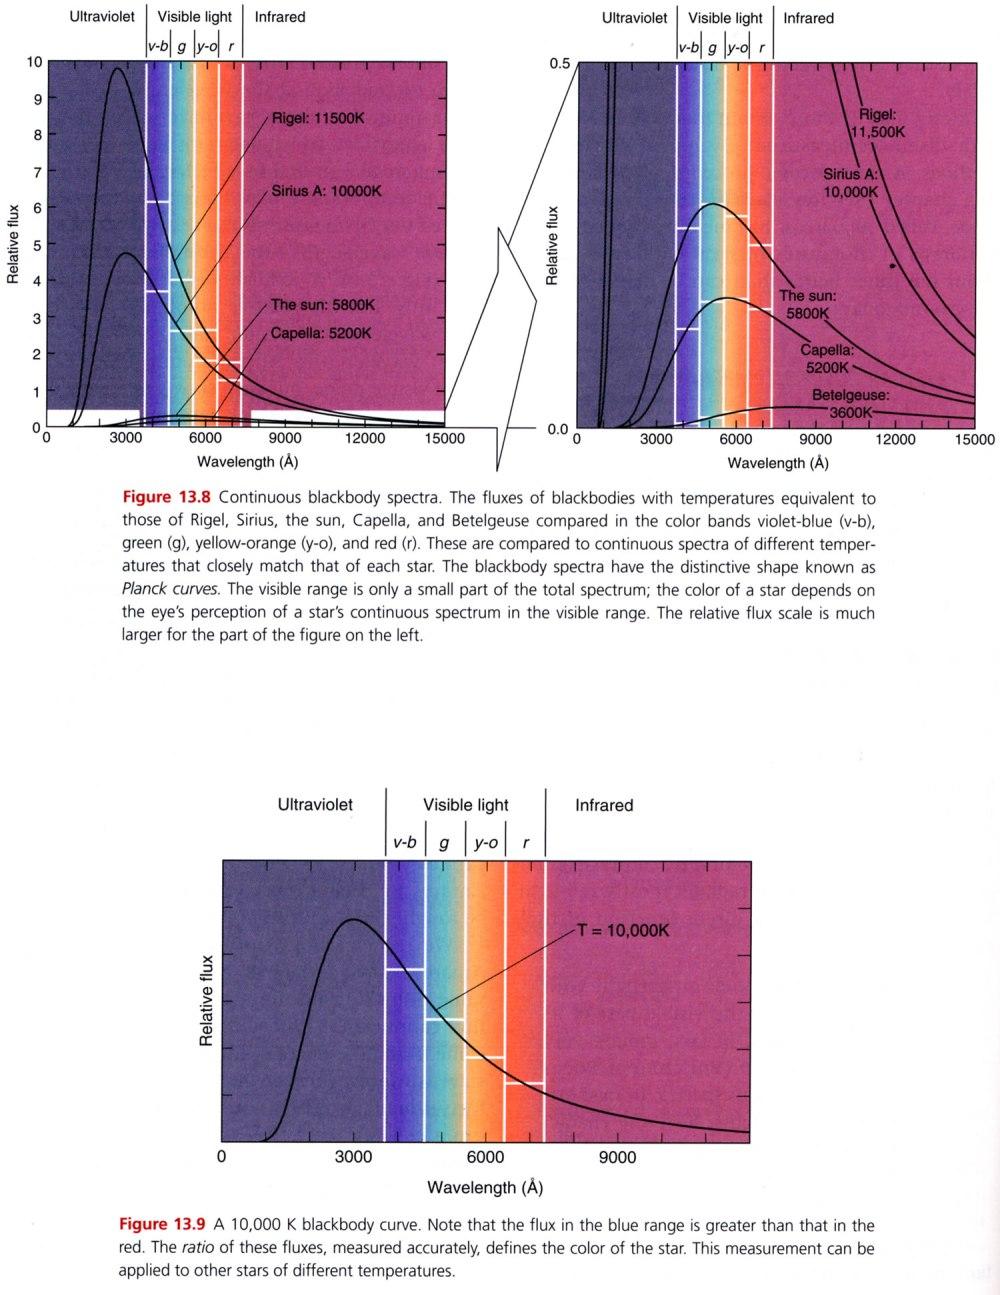 medium resolution of from blackbody model can determine temperature of stars